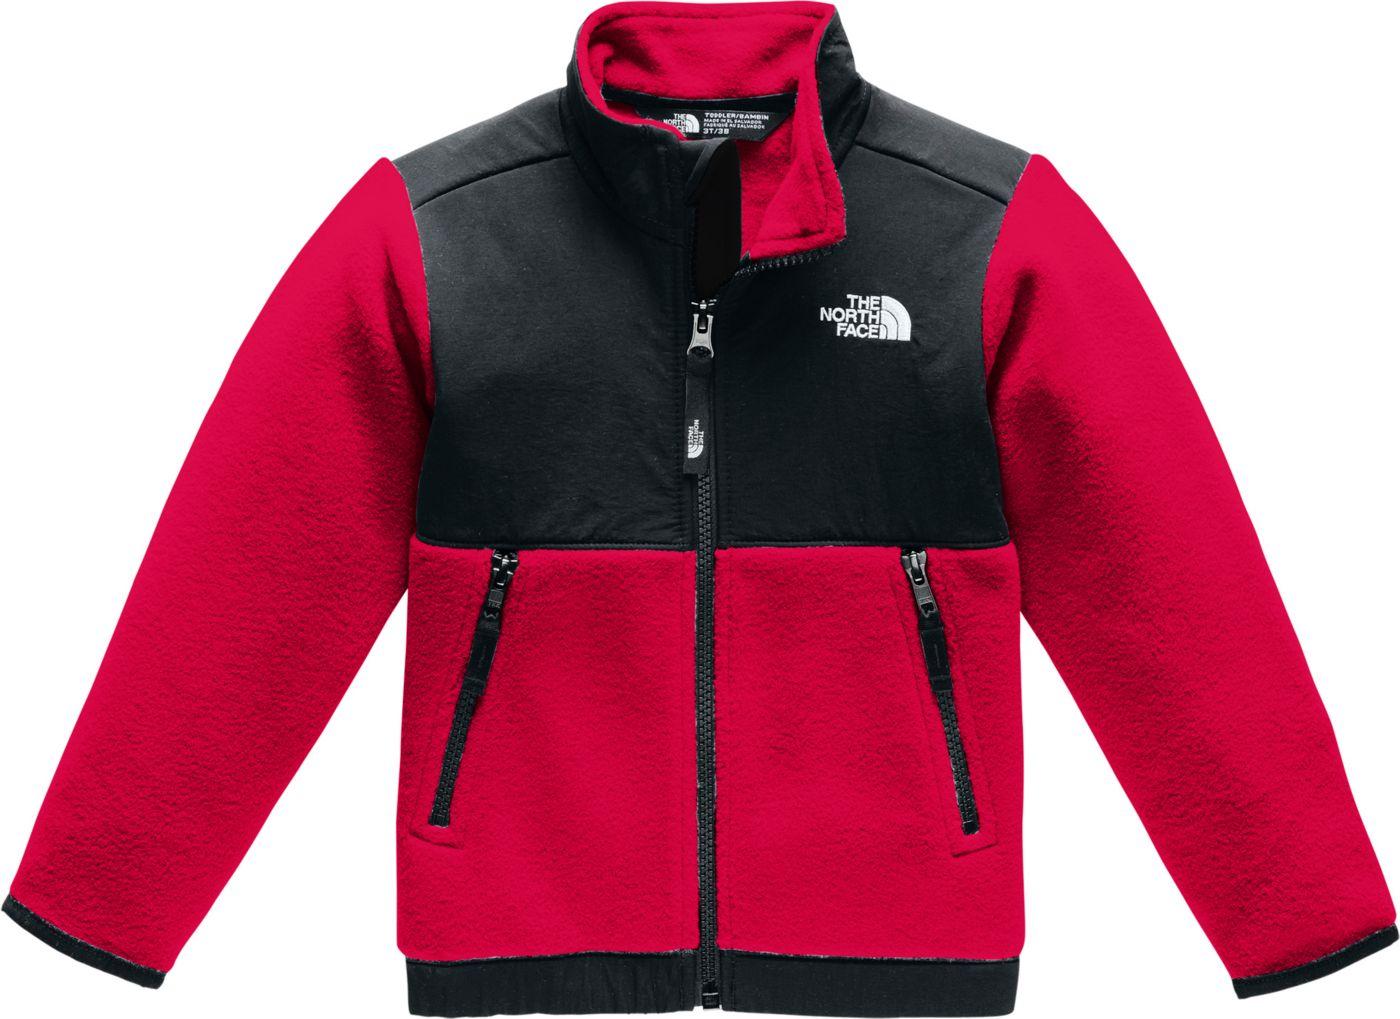 The North Face Toddler Denali Jacket